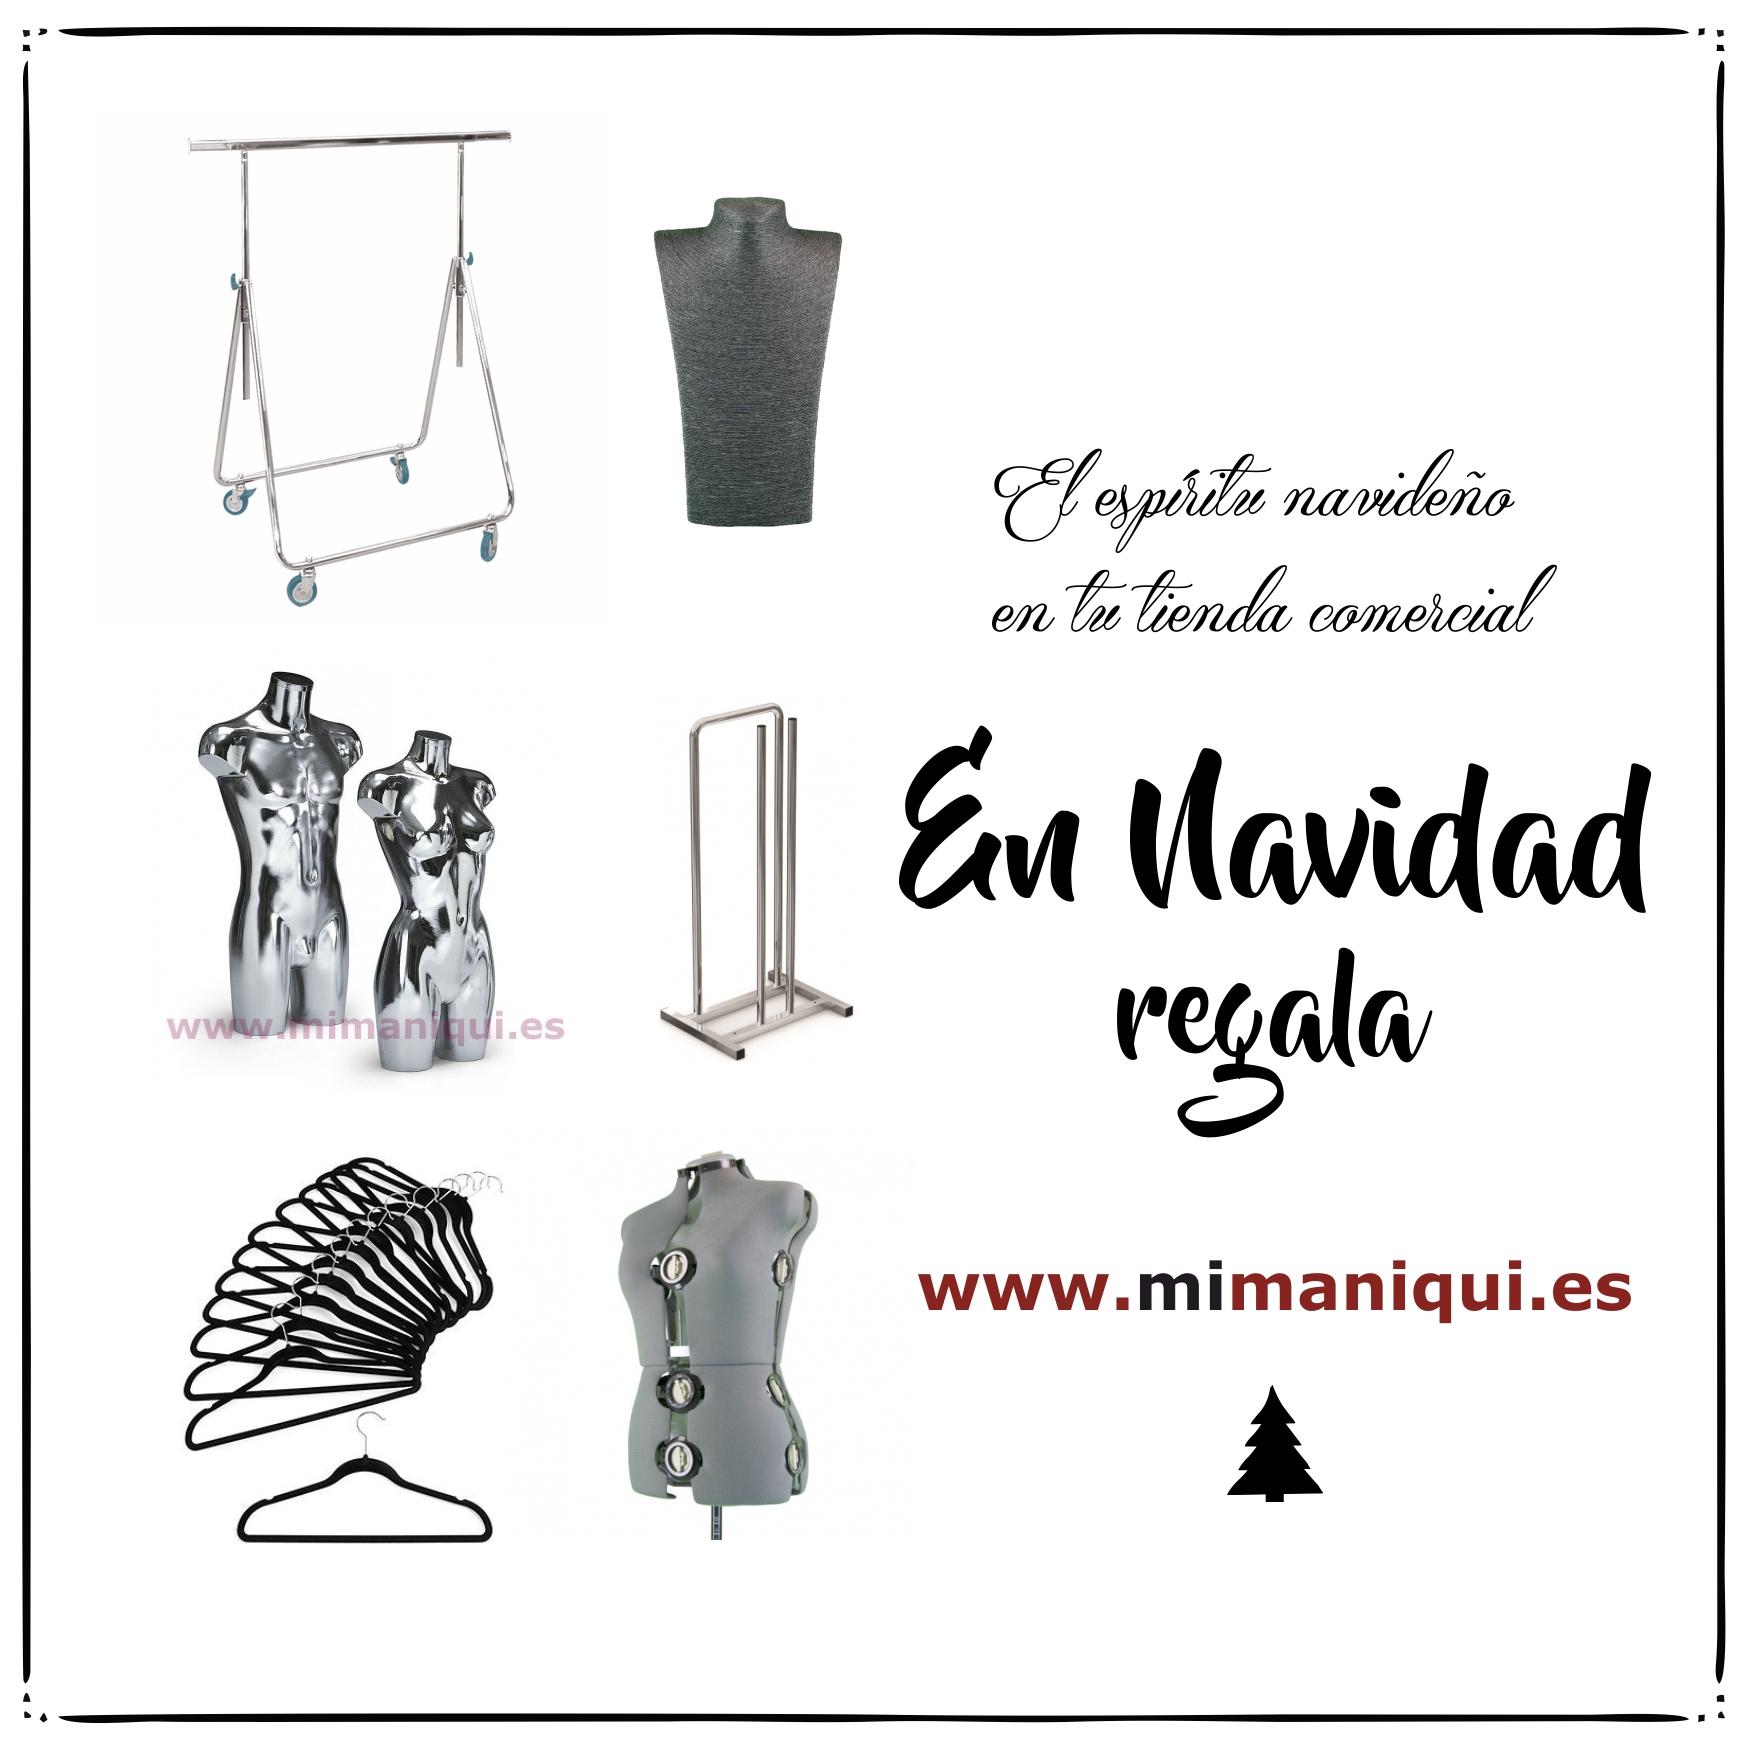 navidad www.mimaniqui.es